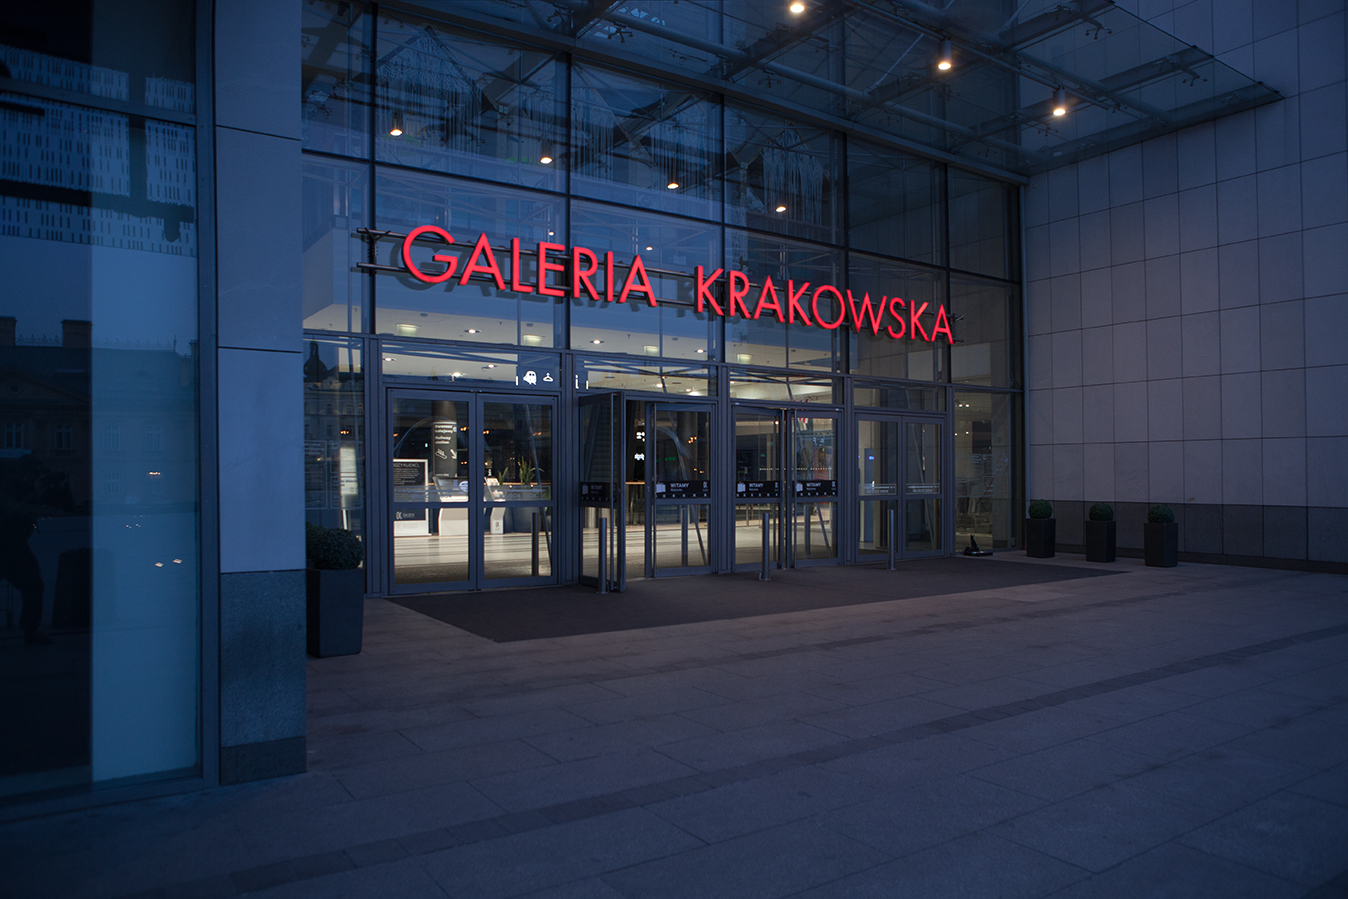 sebastian_strama_galeria krakowska